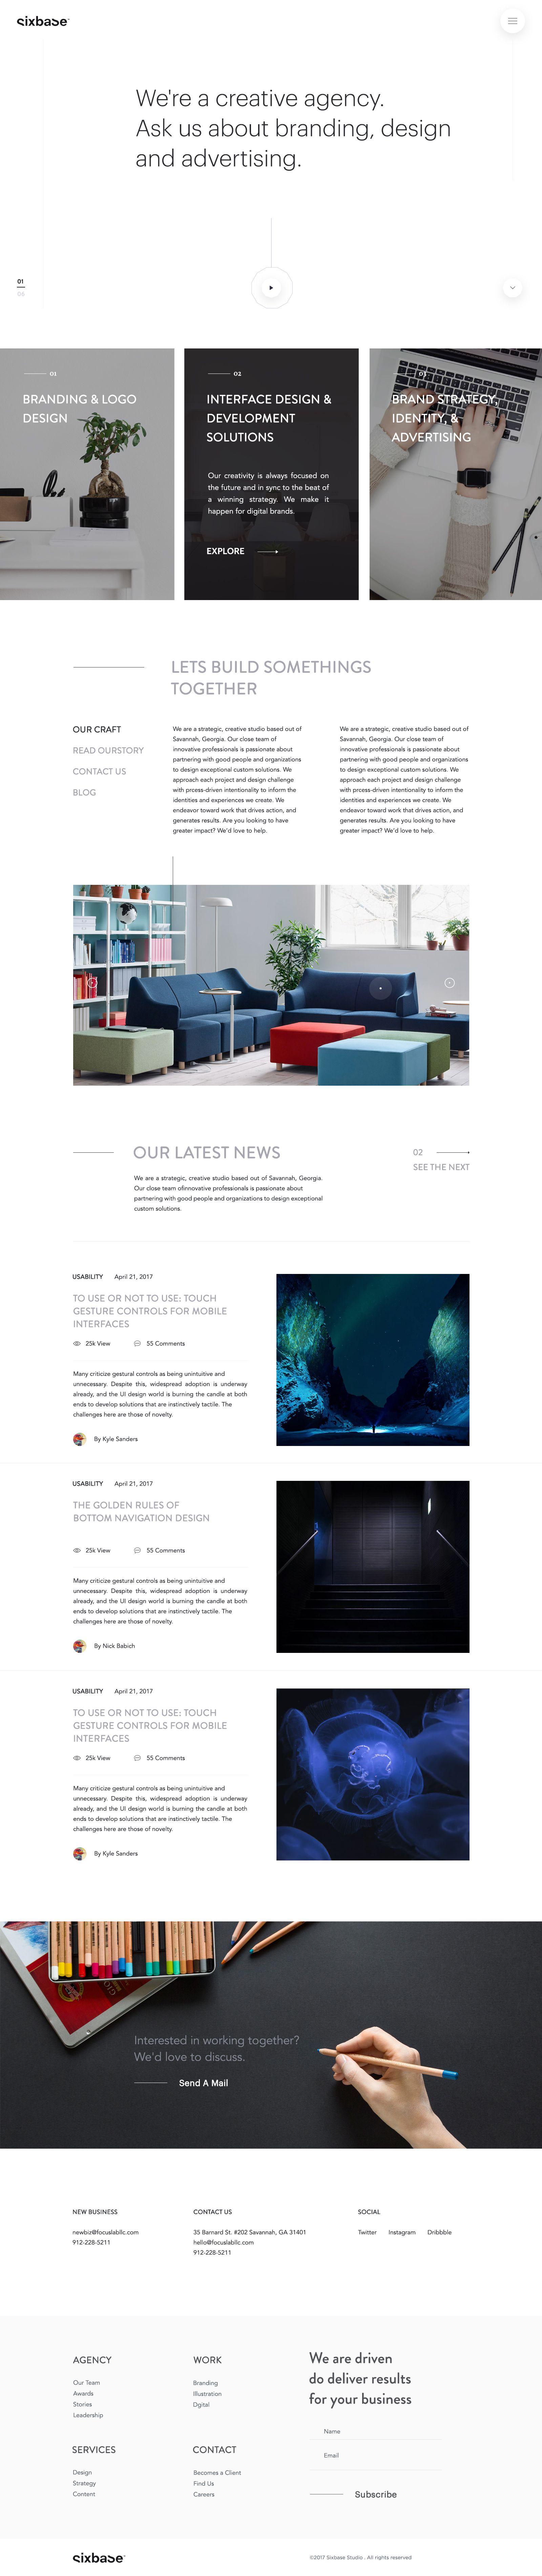 Studio Landing Page Design Concept 02 Creative Web Design Best Web Design Web Design Trends